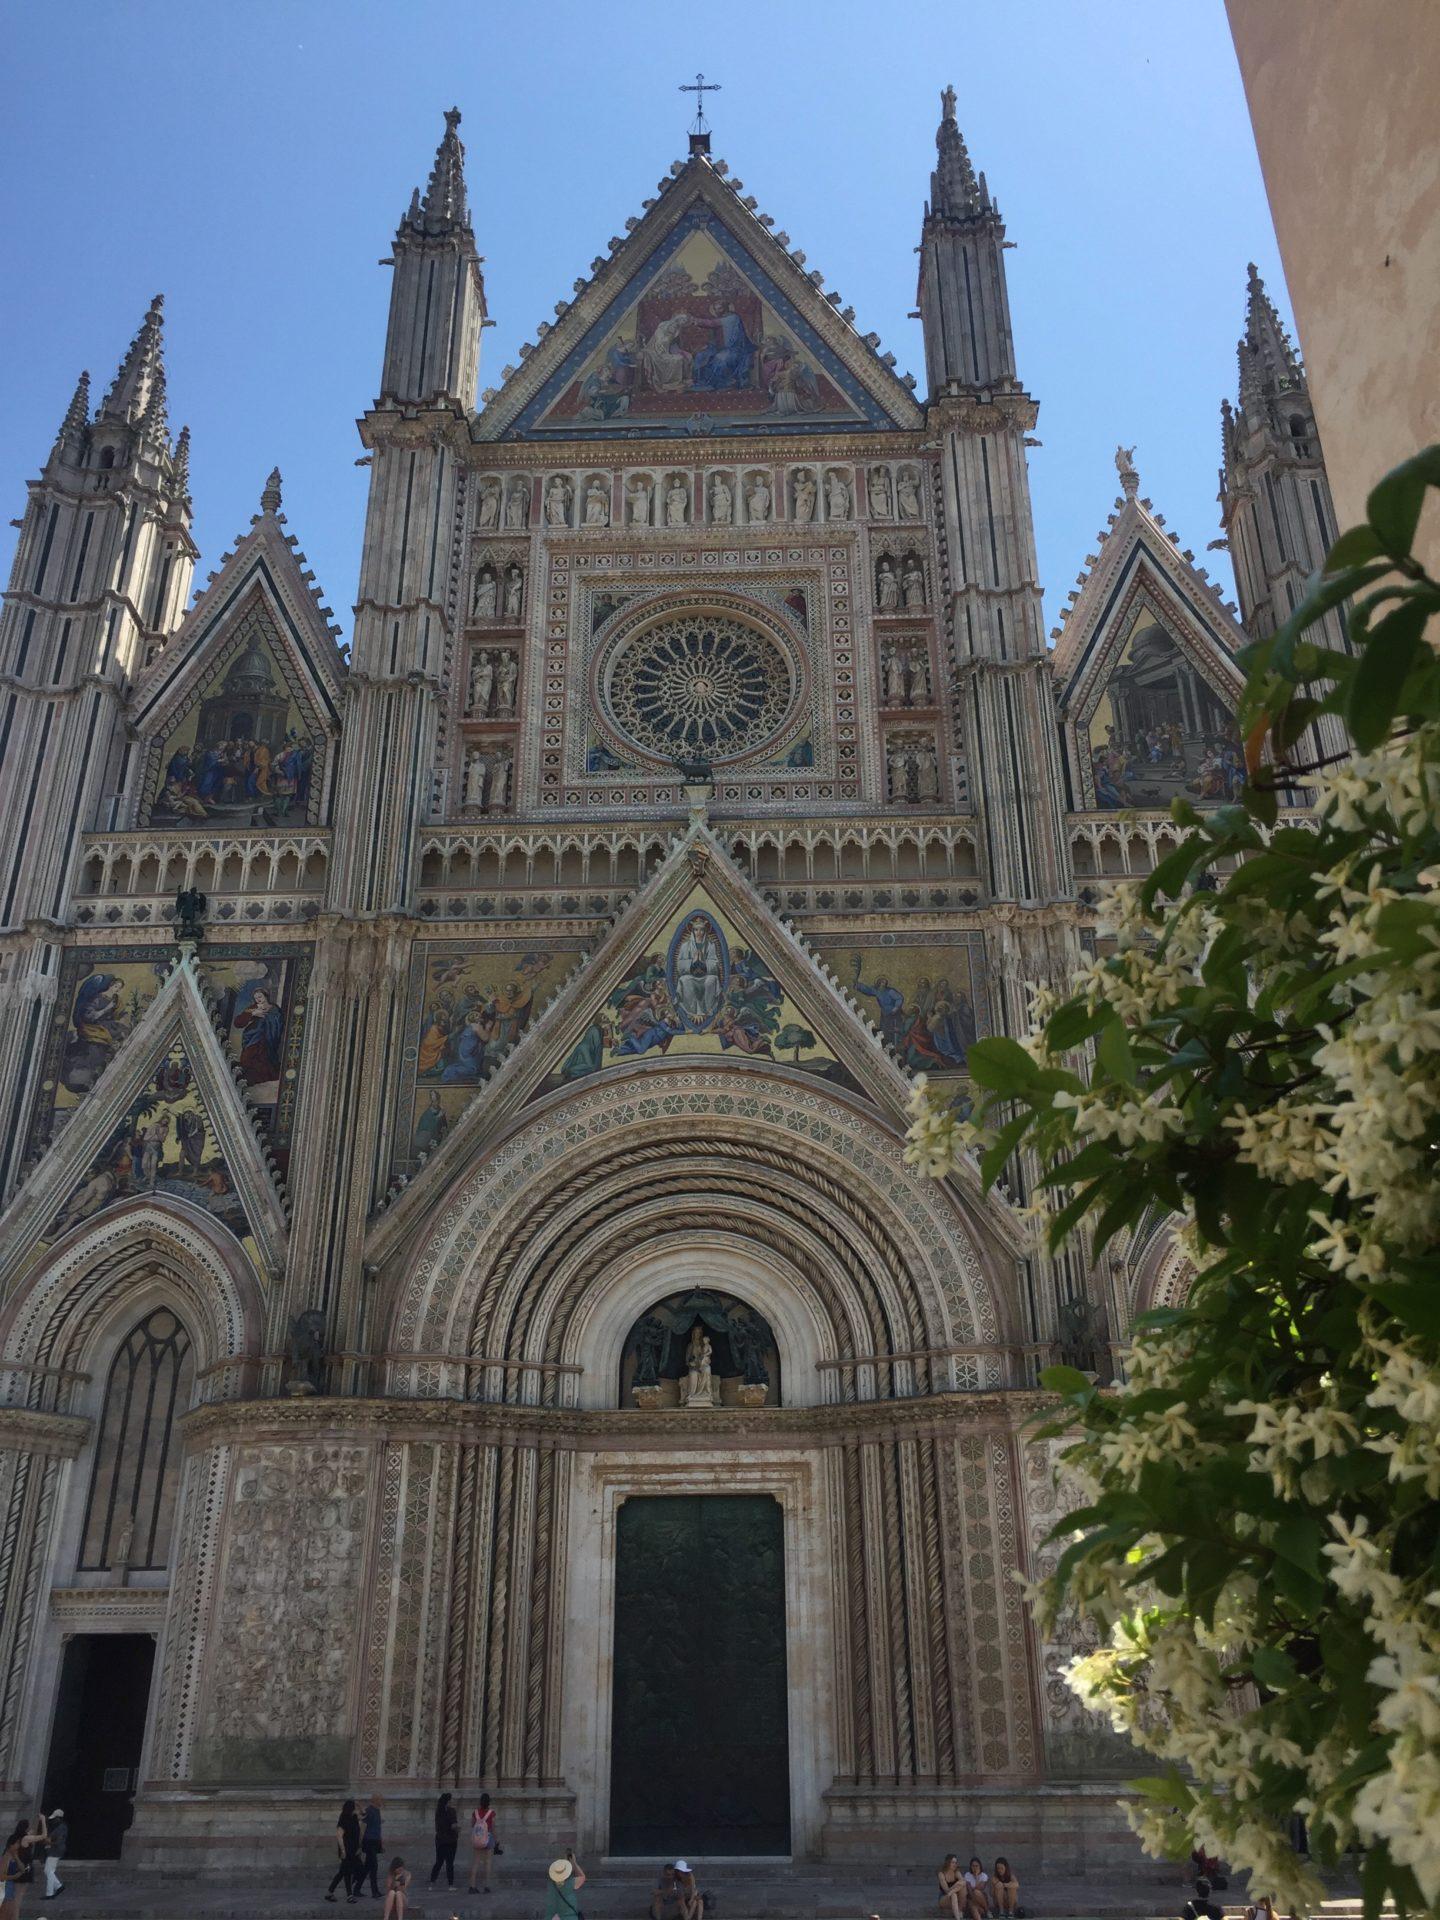 "<img src=""http://marenostrum.pl/wp-content/uploads//2019/10/Fasada-katedry-Orvieto.jpeg"" alt=""Fasada katedry w Orvieto"" />"